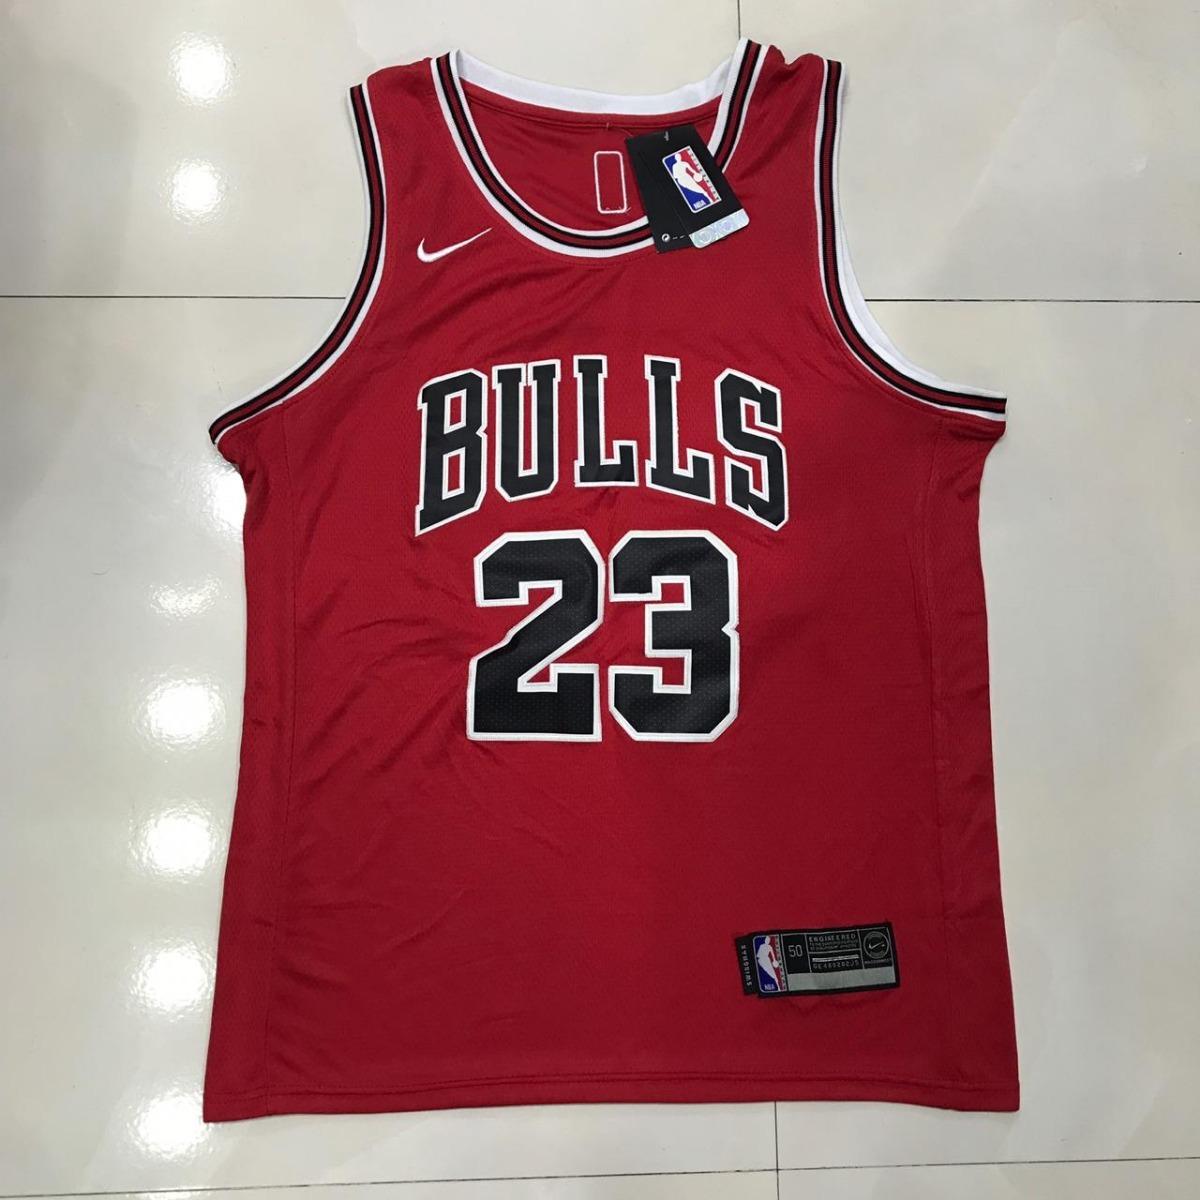 5e884c74499 regata de basquete jordan chicago bulls original - oferta. Carregando zoom.